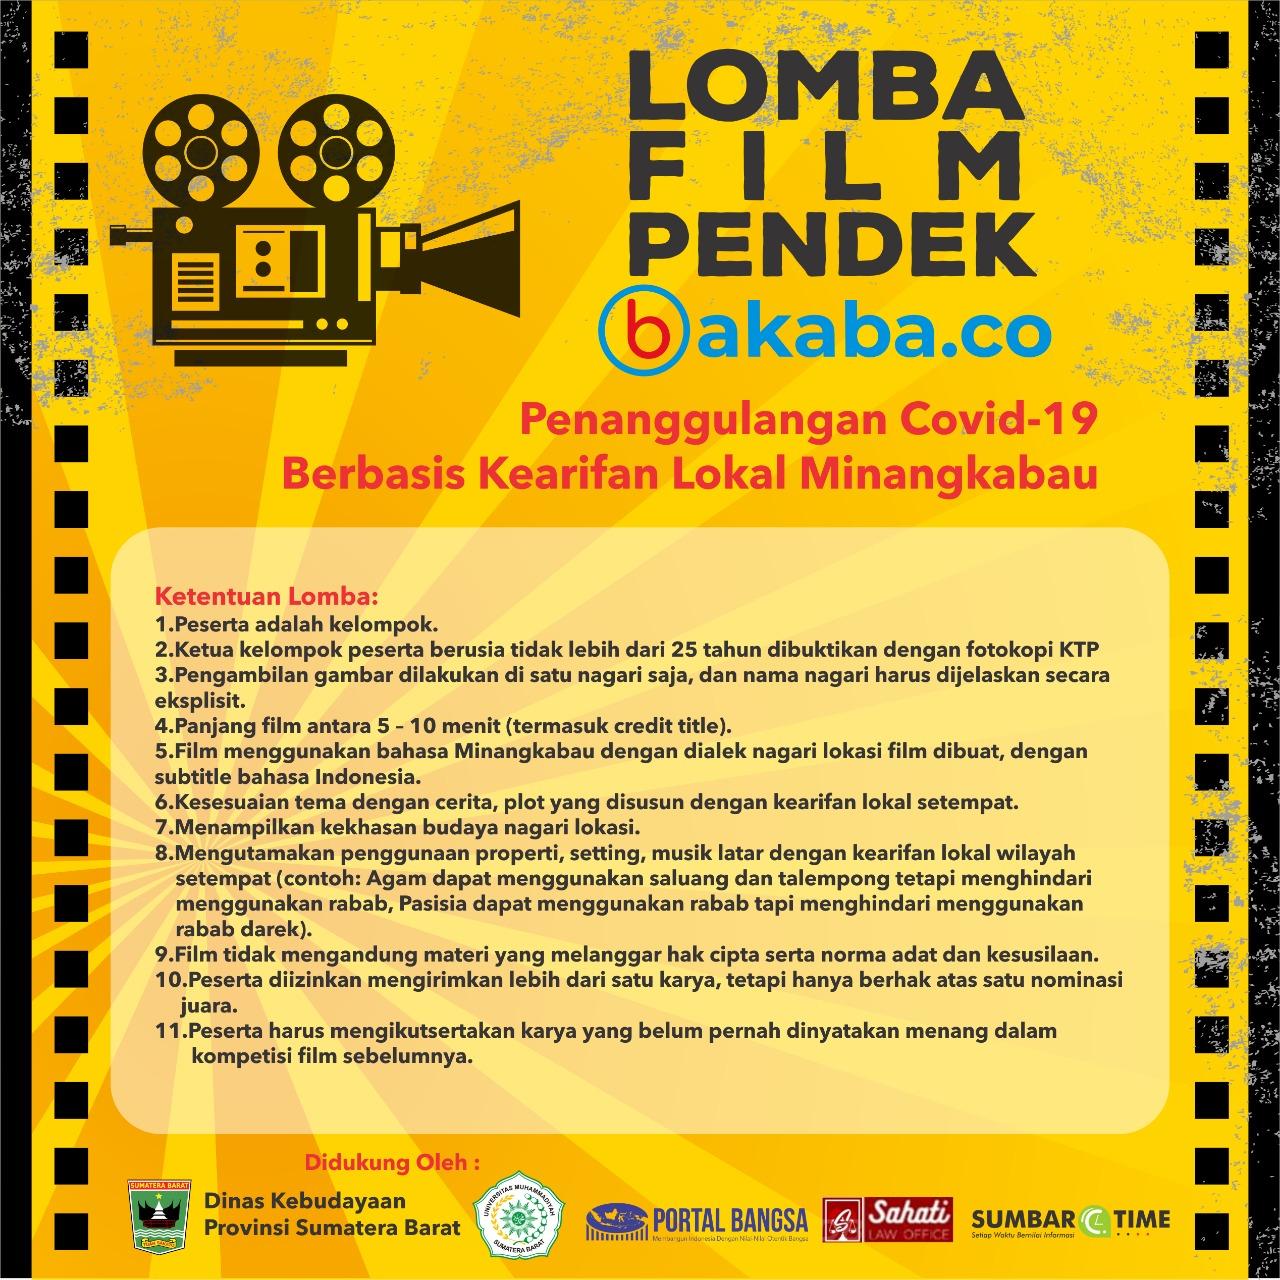 Lomba Film Pendek bakaba